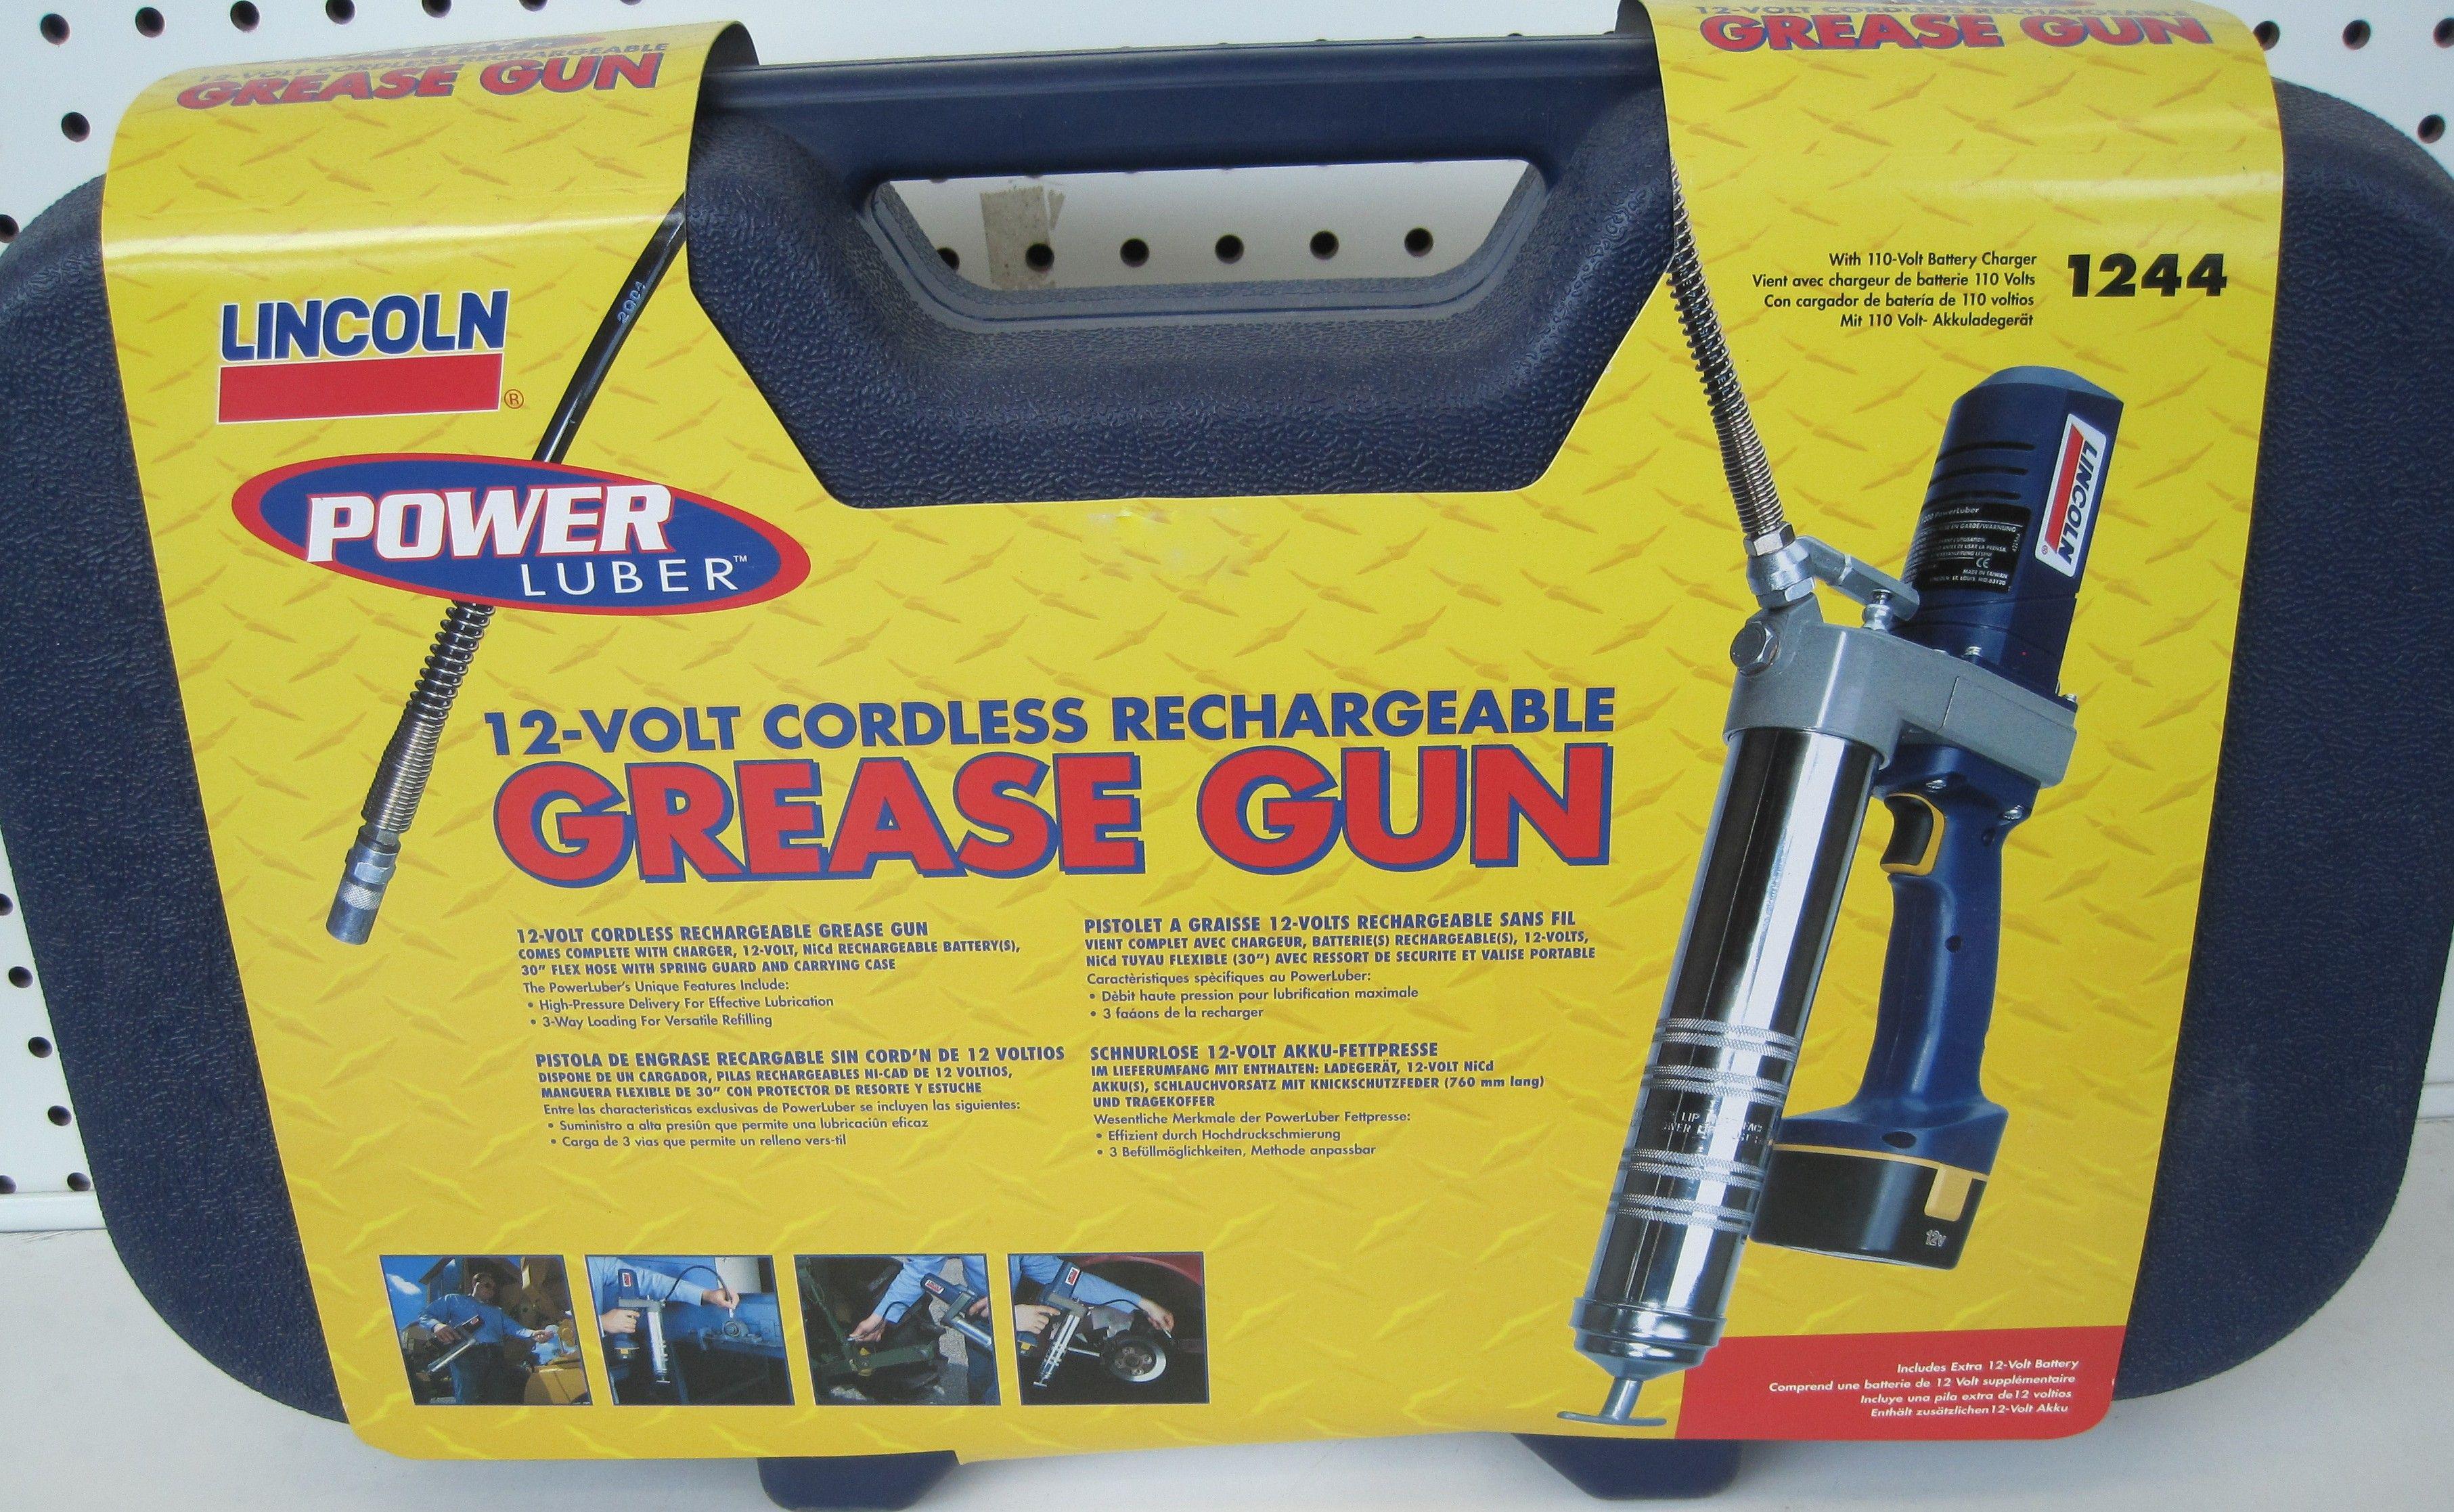 12 volt cordless rechargable Grease Gun by Lincoln LIN-1244